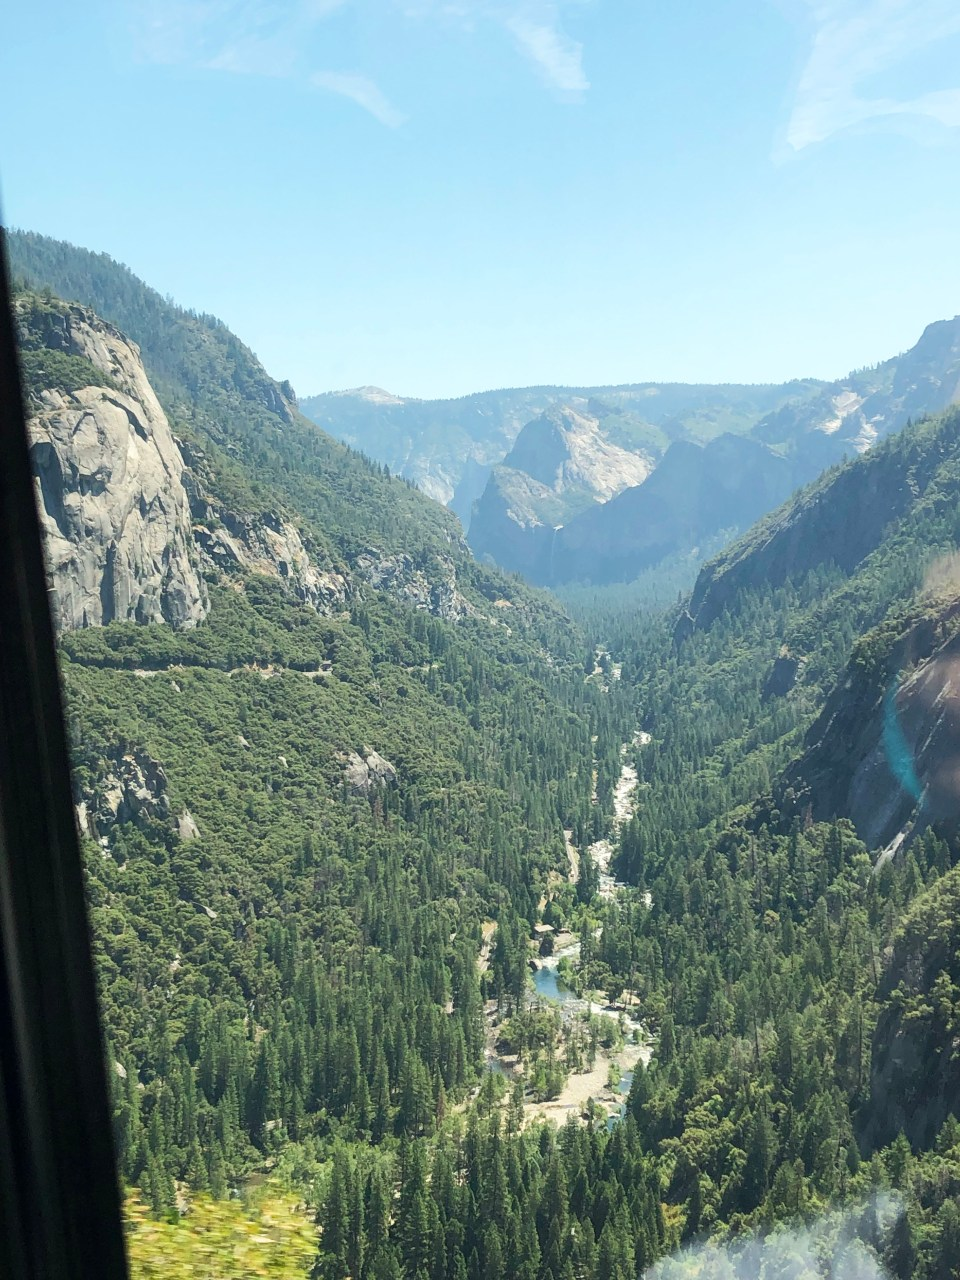 Road to Yosemite 1